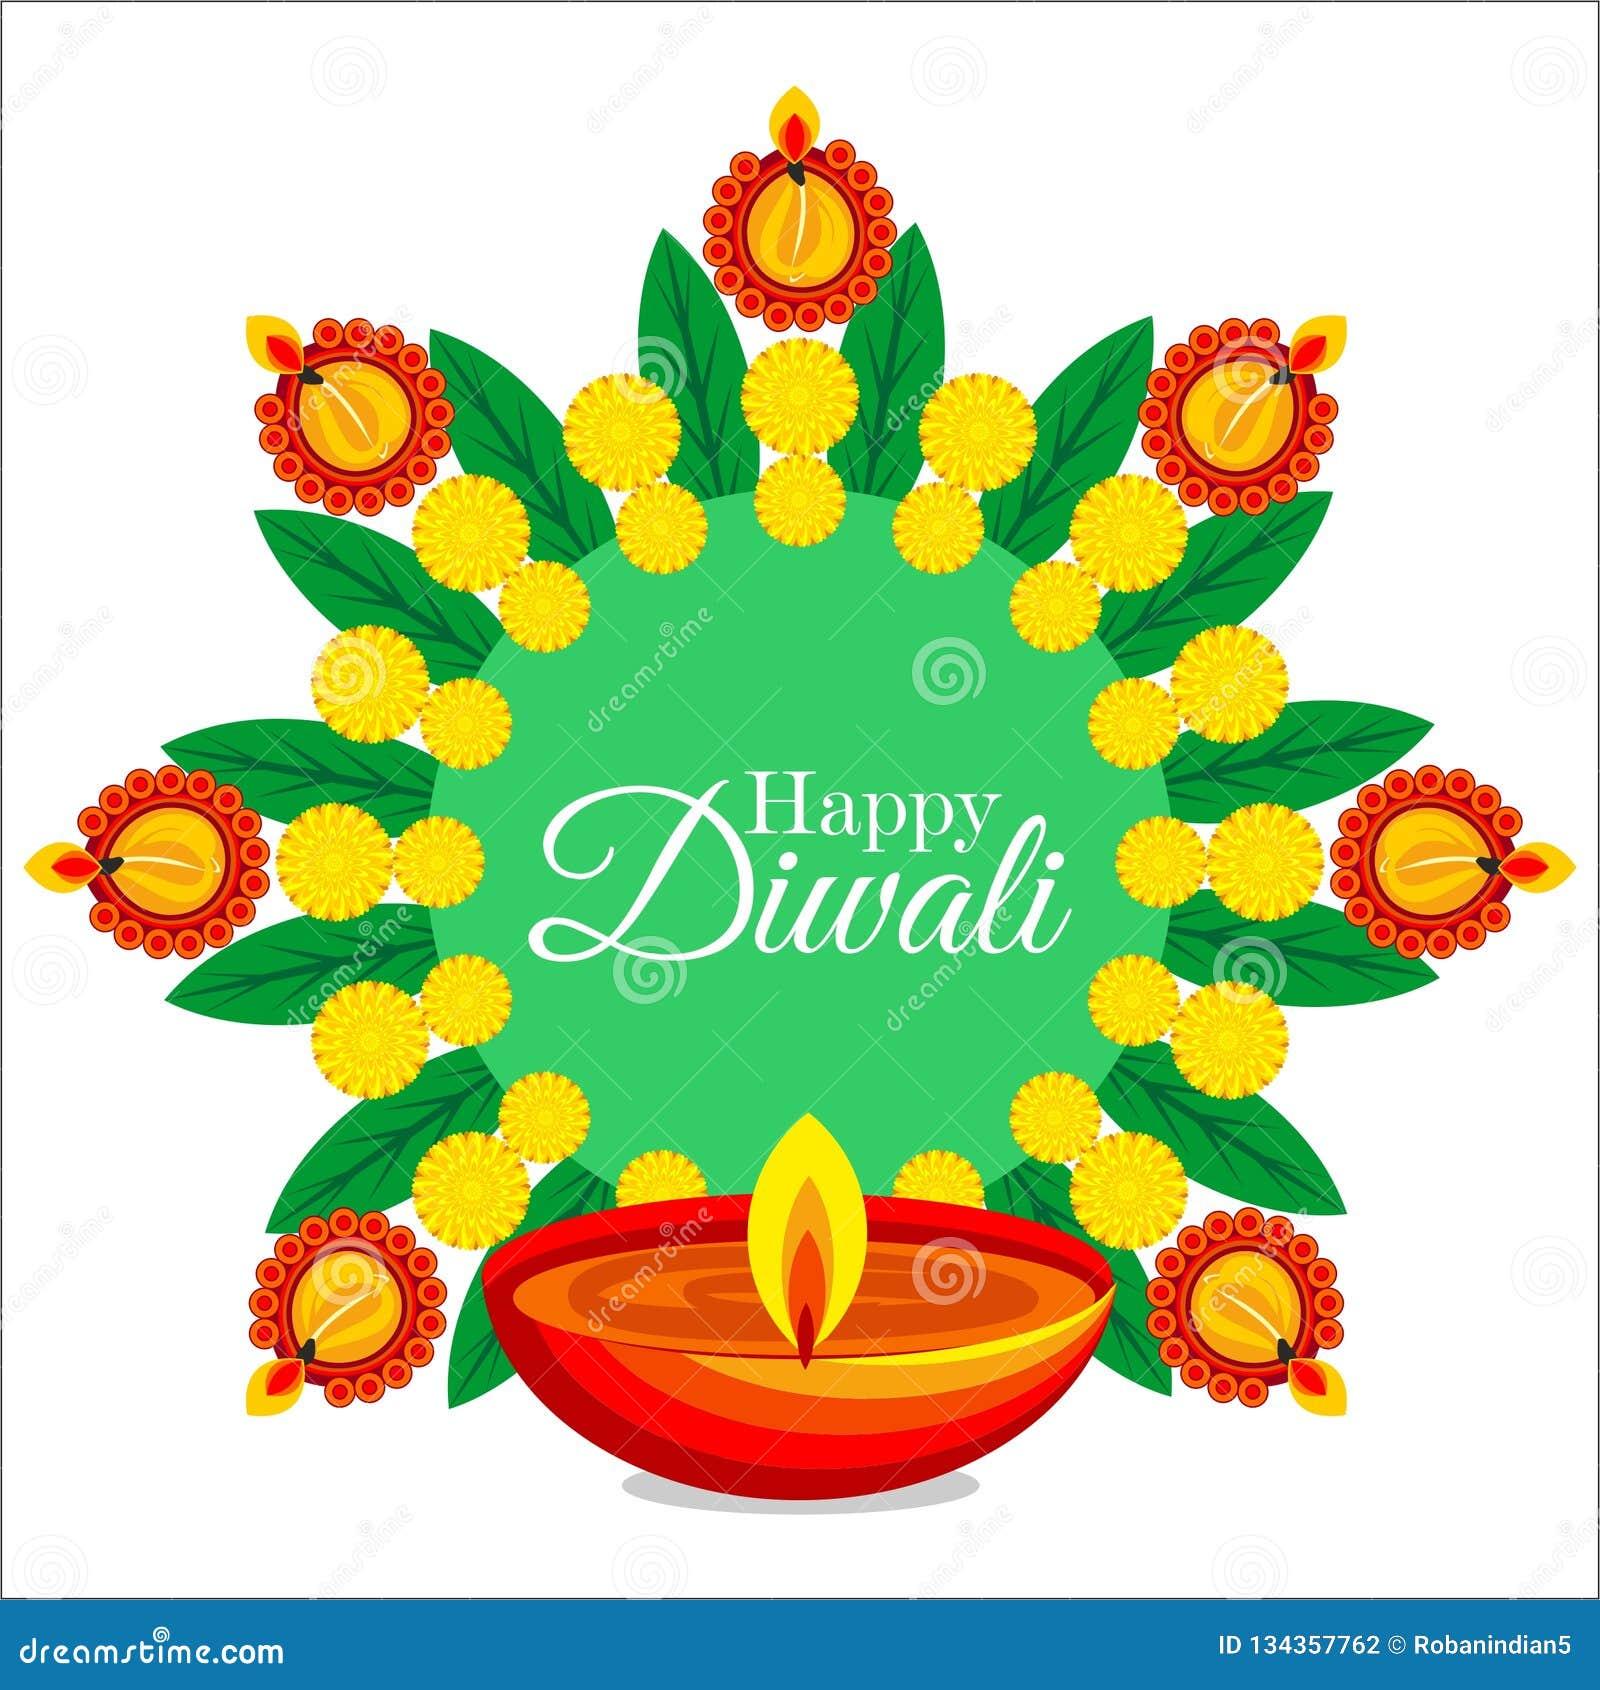 Diwali celebration india happy creative illustration diya diyas lights indian north colour rangoli fest festival art drawing religous god worship asia asian